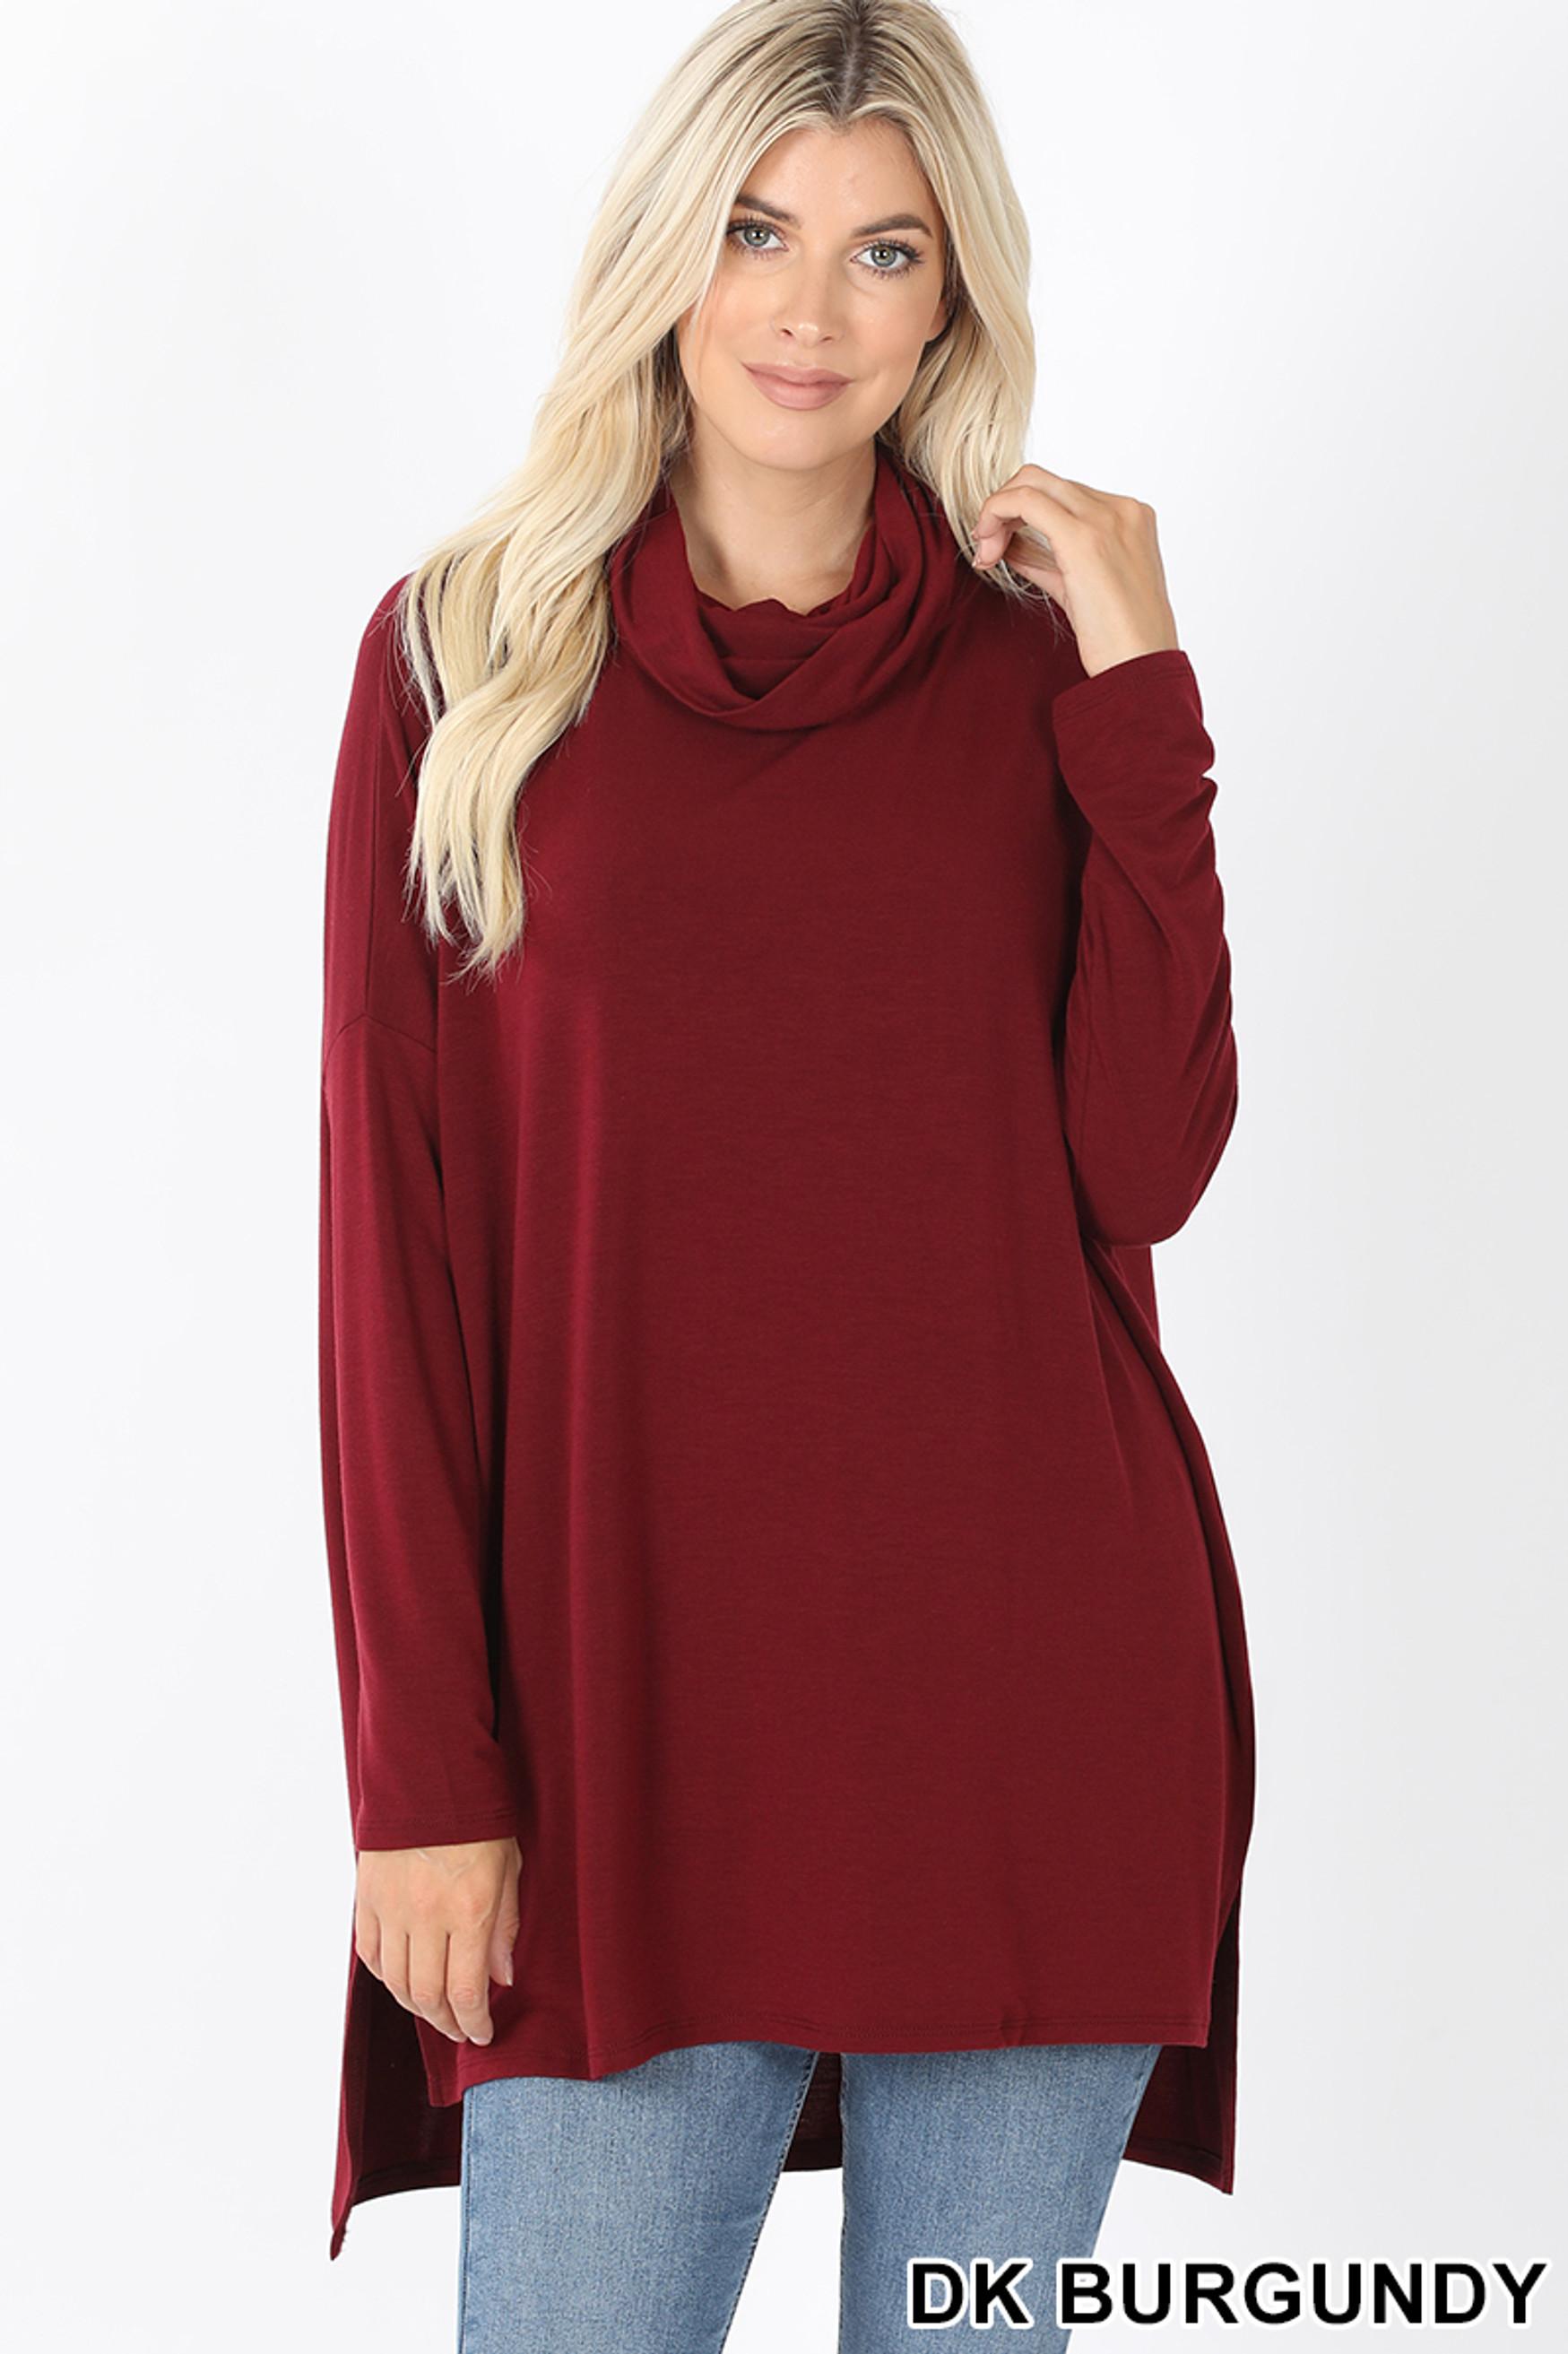 Front image of Dark Burgundy Cowl Neck Hi-Low Long Sleeve Plus Size Top